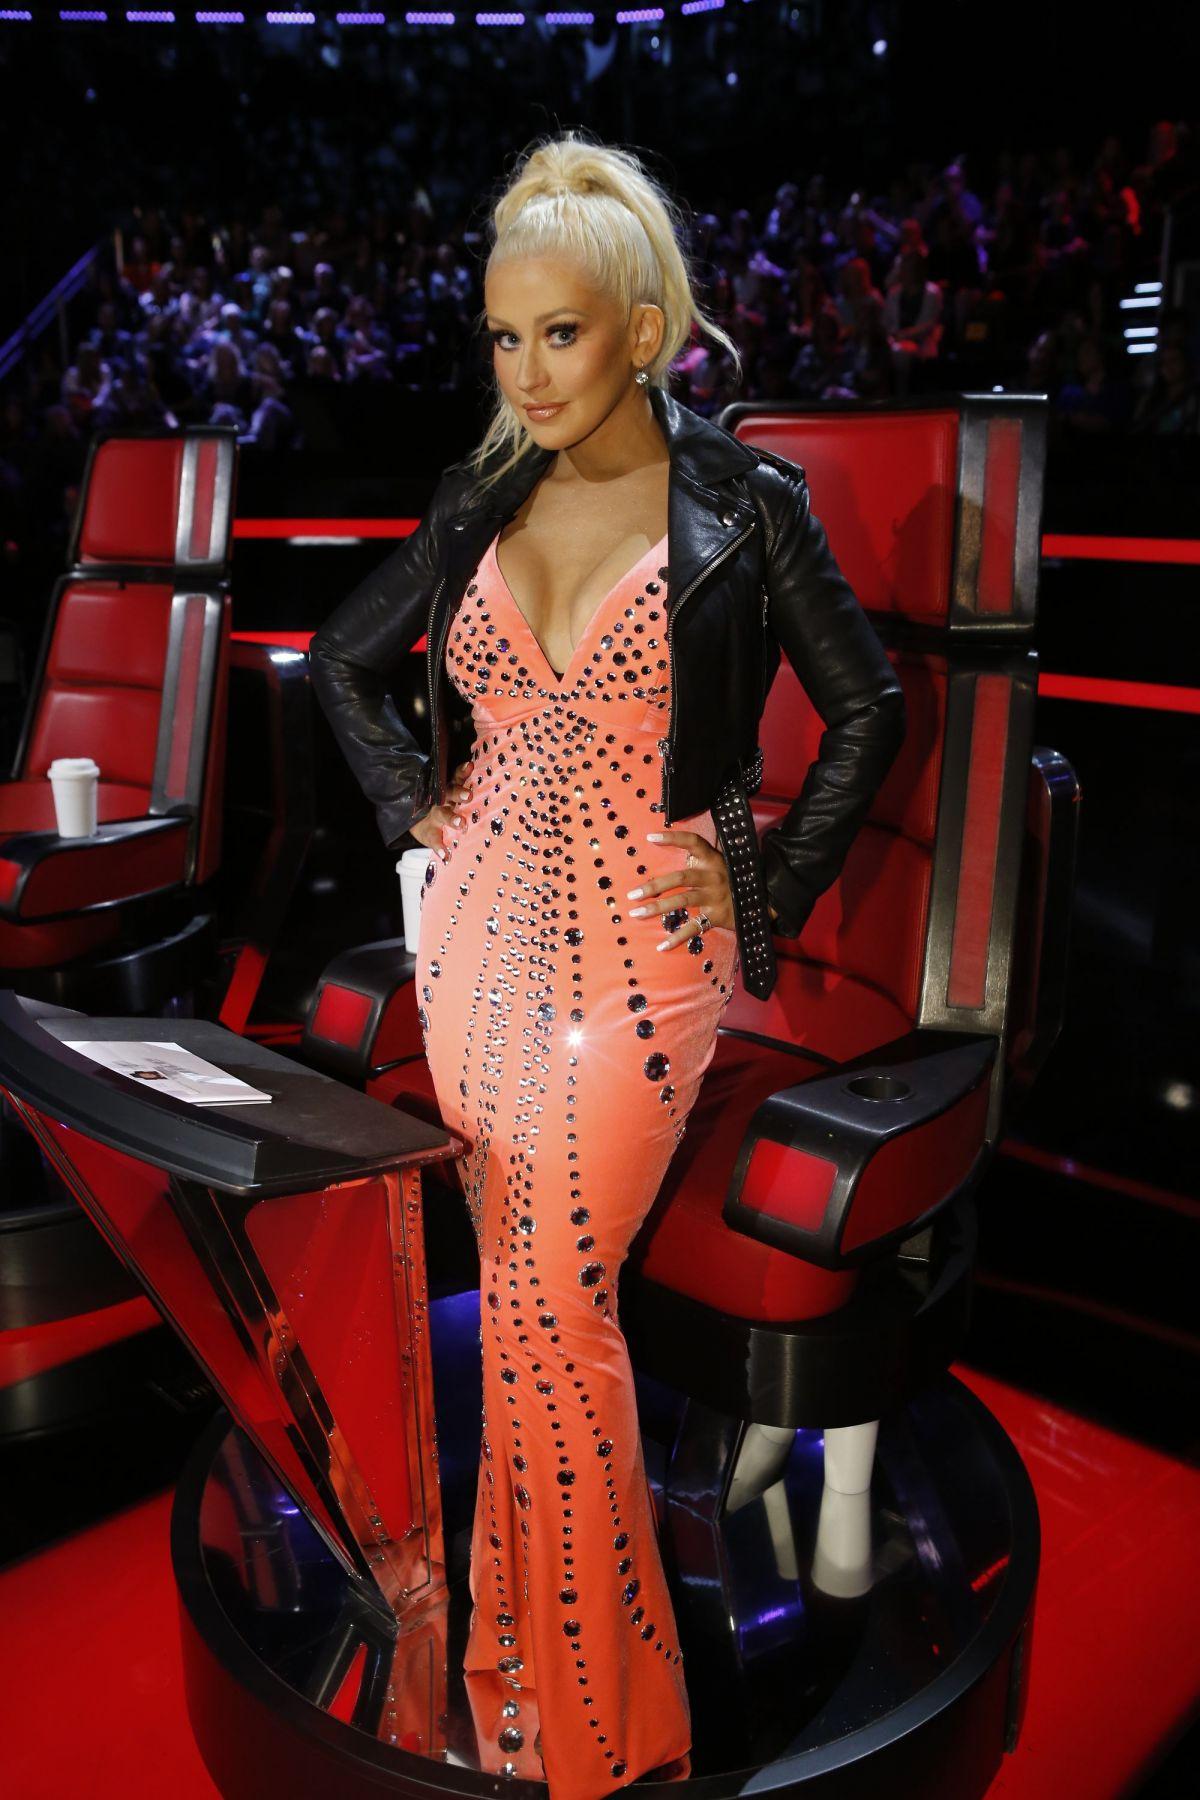 Christina Aguilera on The Voice, season 10